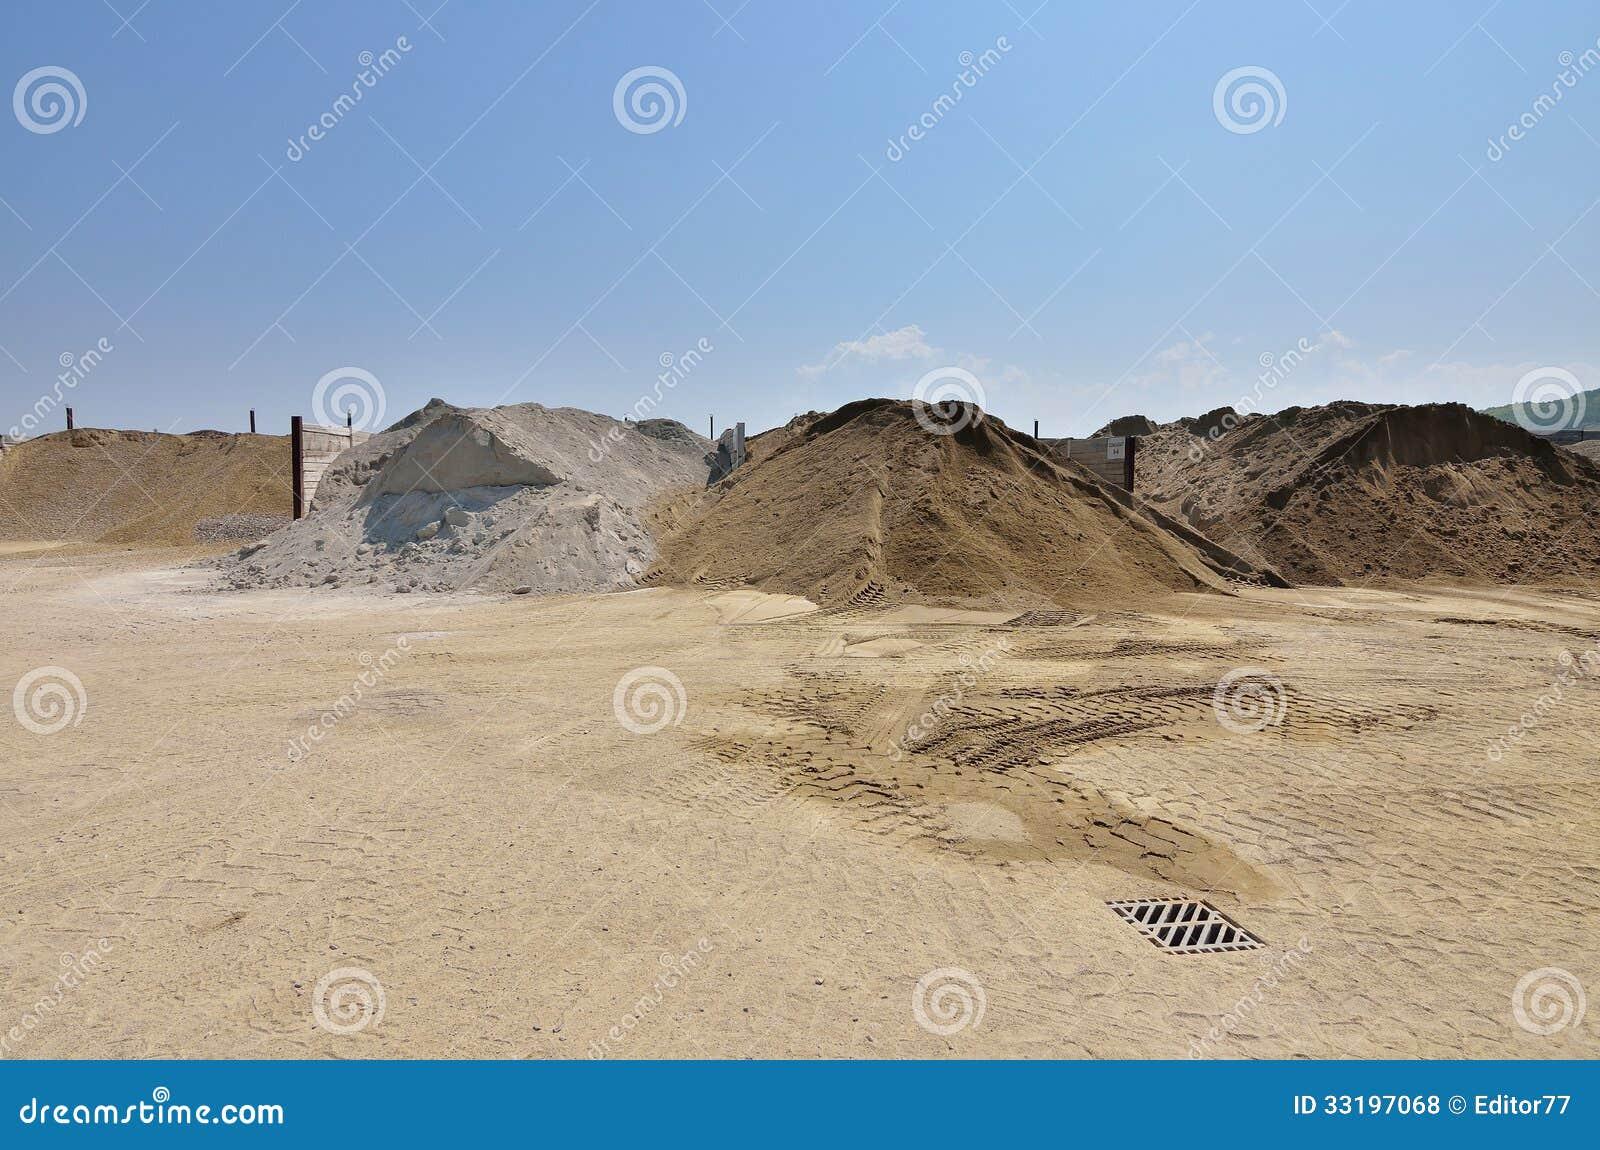 http://thumbs.dreamstime.com/z/warehouse-gravel-sand-materials-manufacturing-cement-asphalt-inside-courtyard-mix-plant-cement-asphalt-33197068.jpg